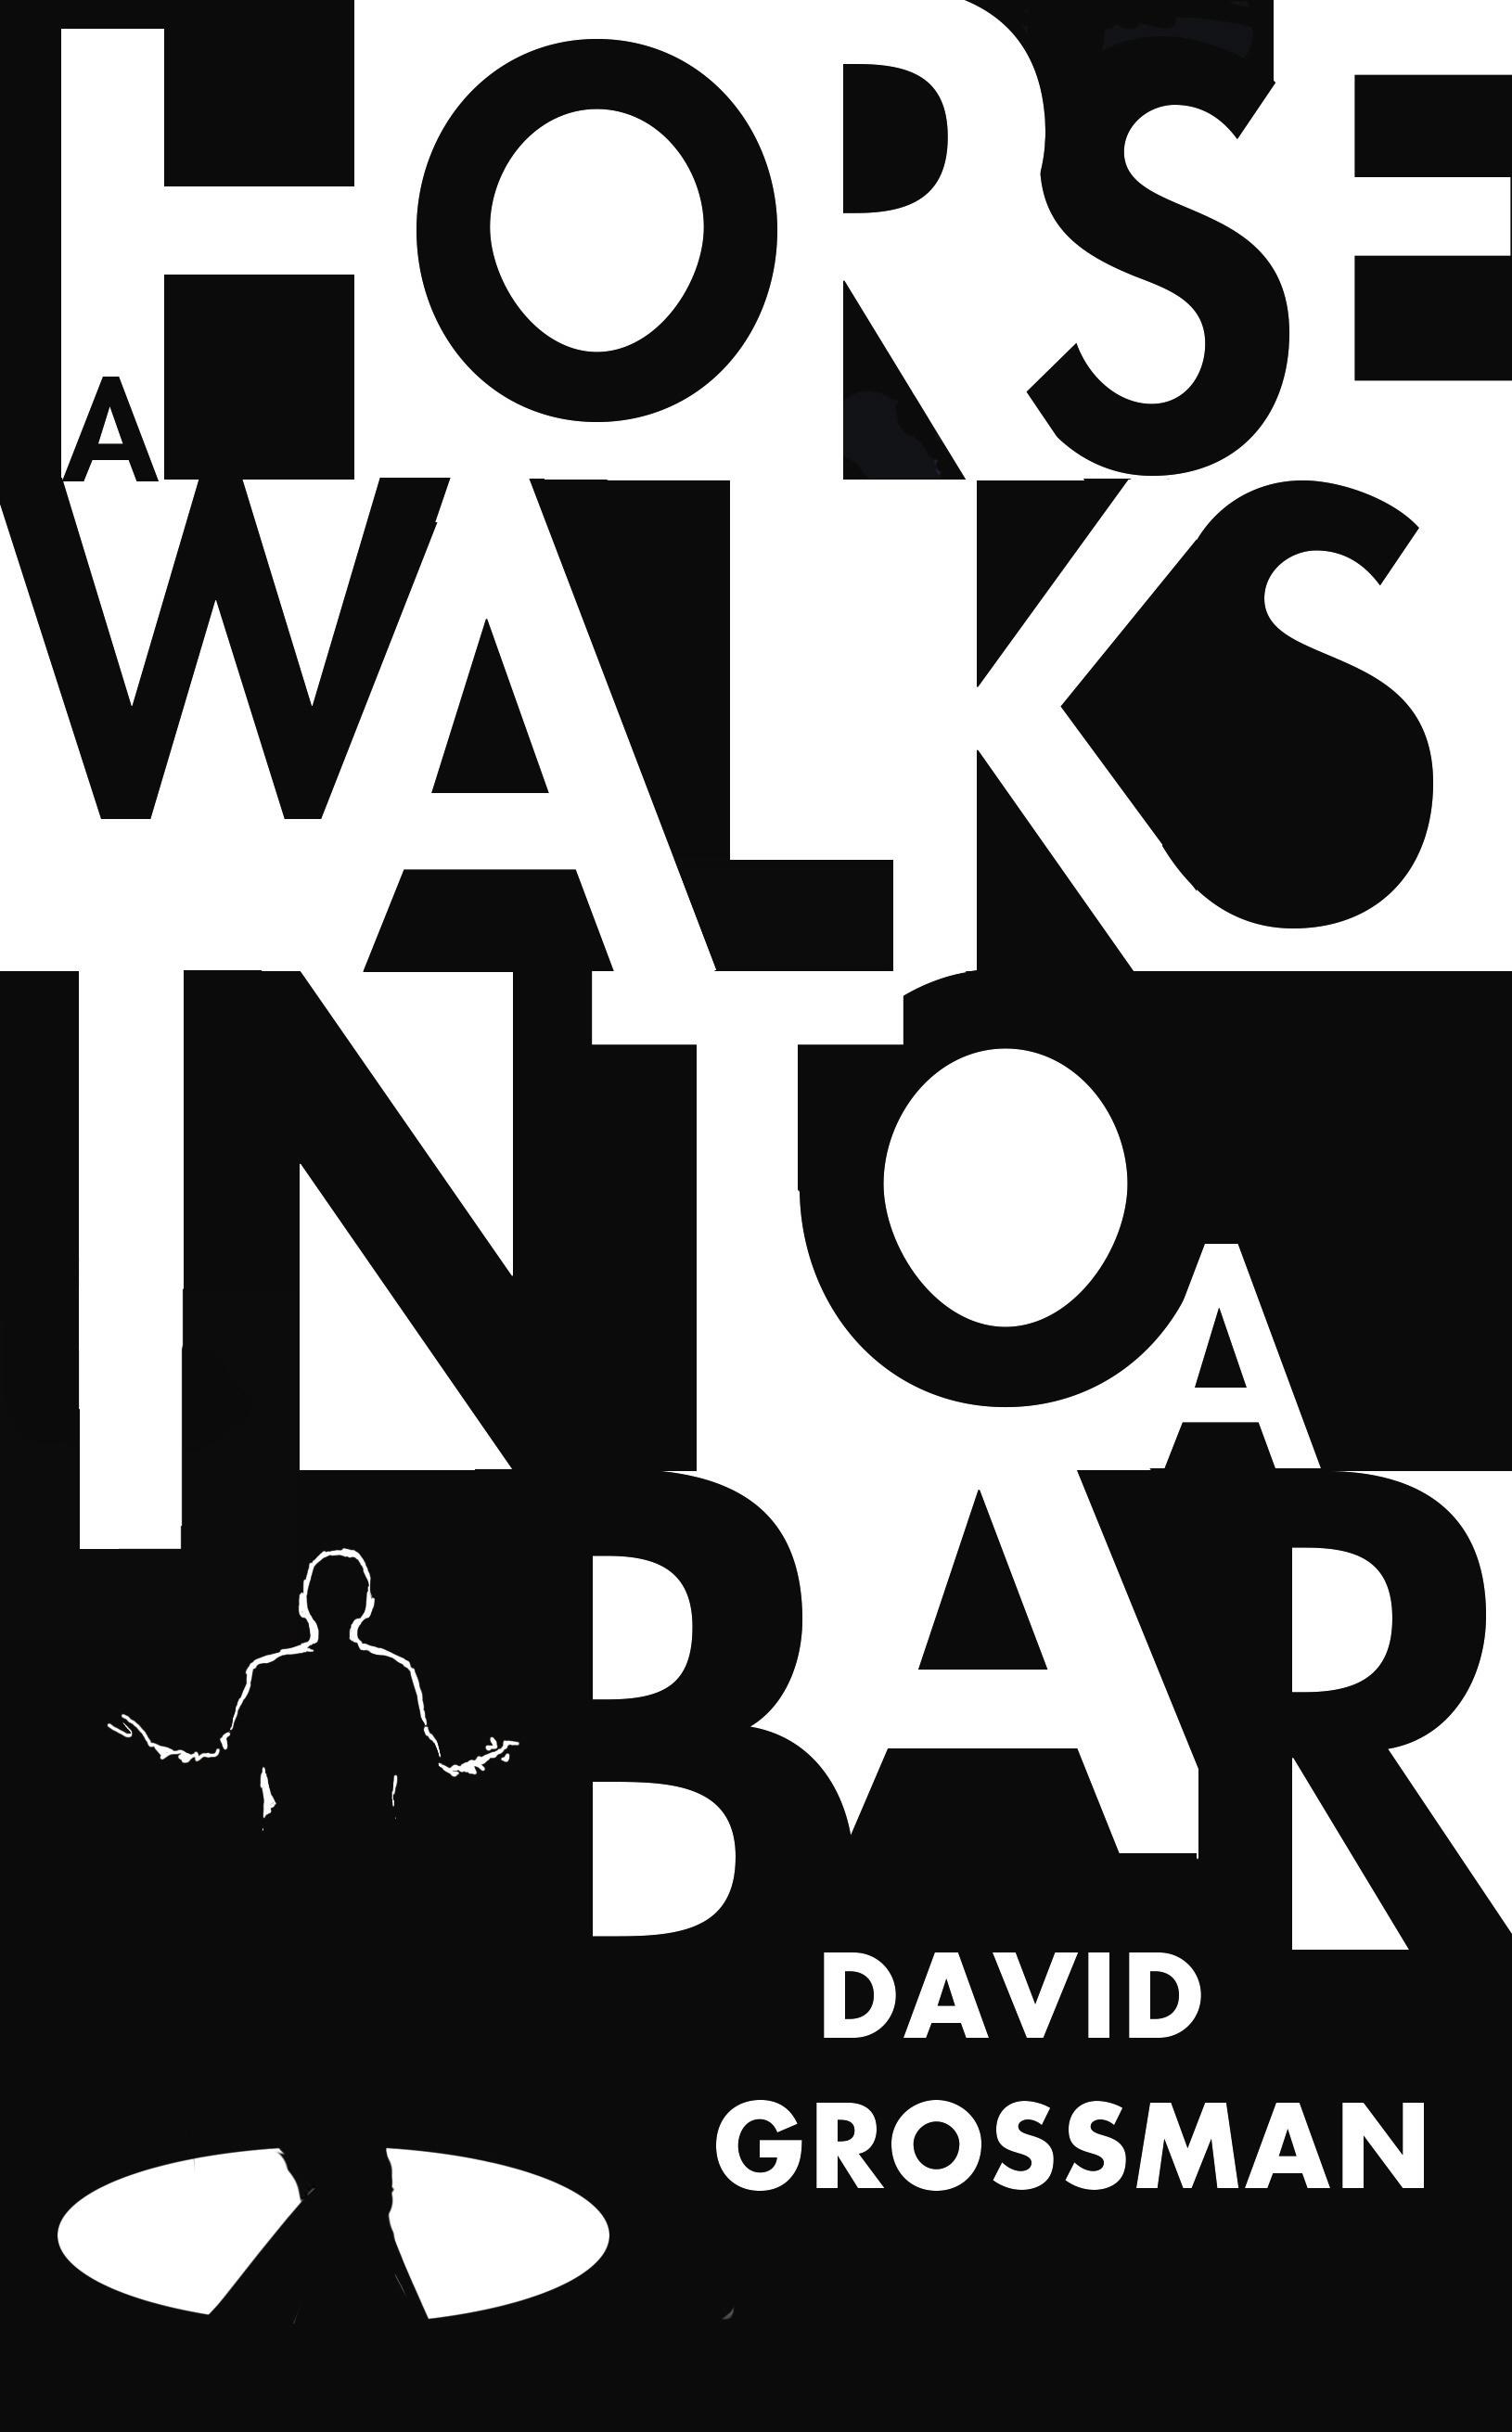 28.david grossman a horse walks into a bar